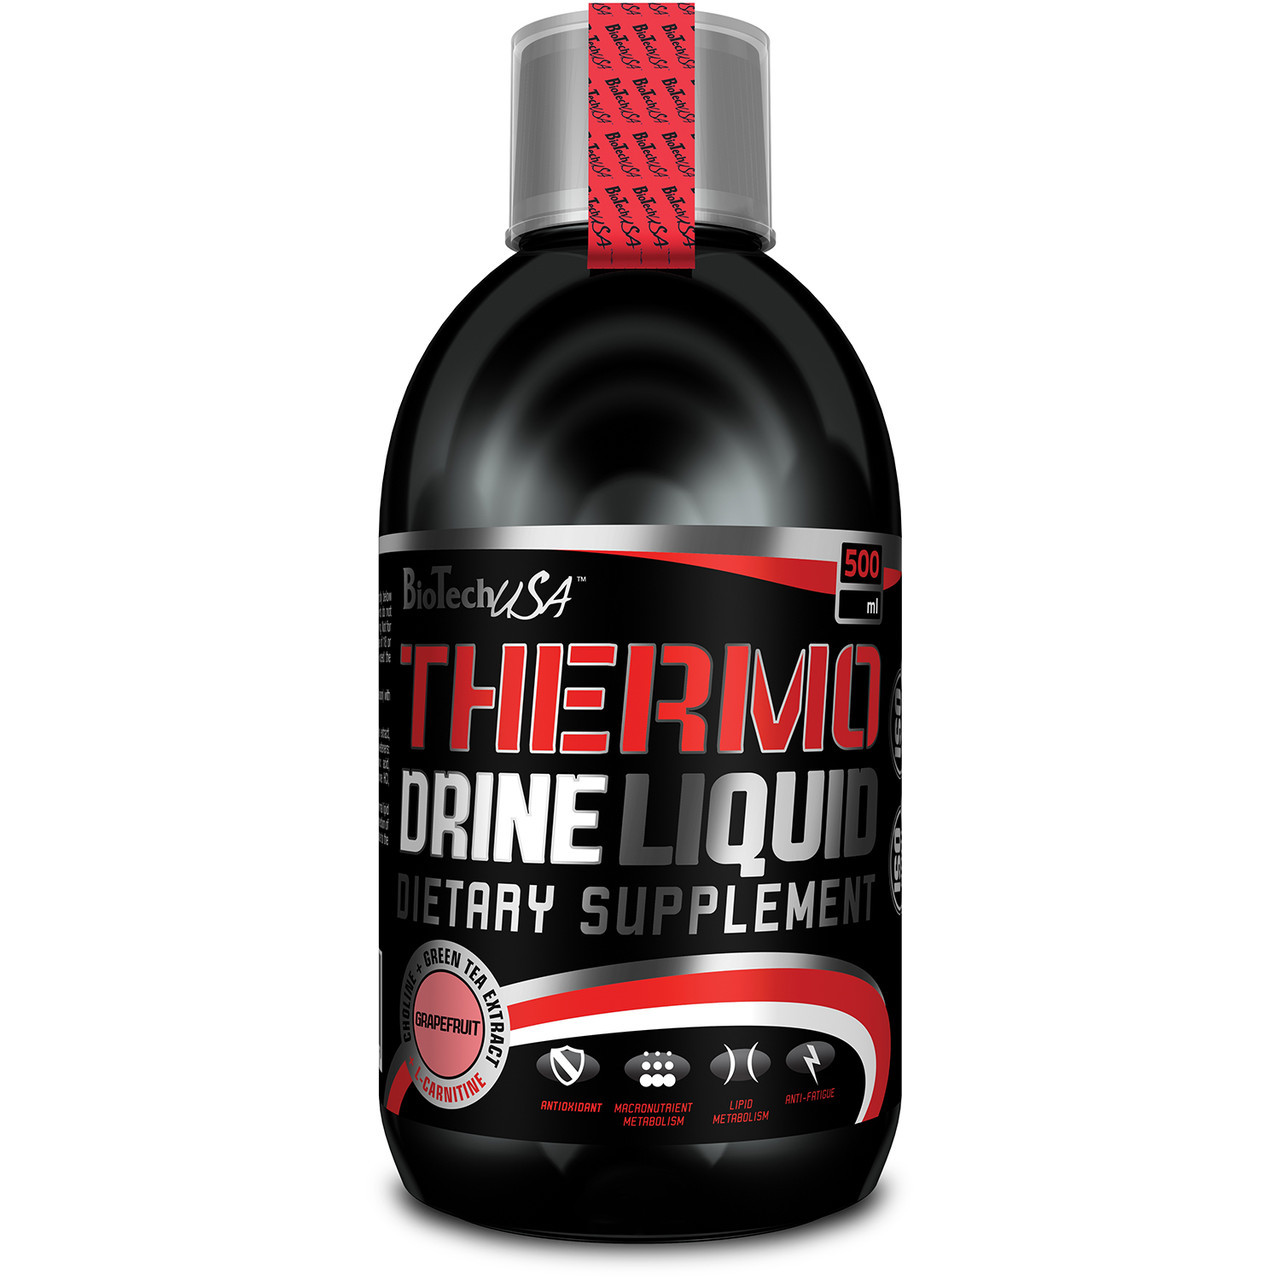 Thermo Drine Liquid BioTech 500 ml